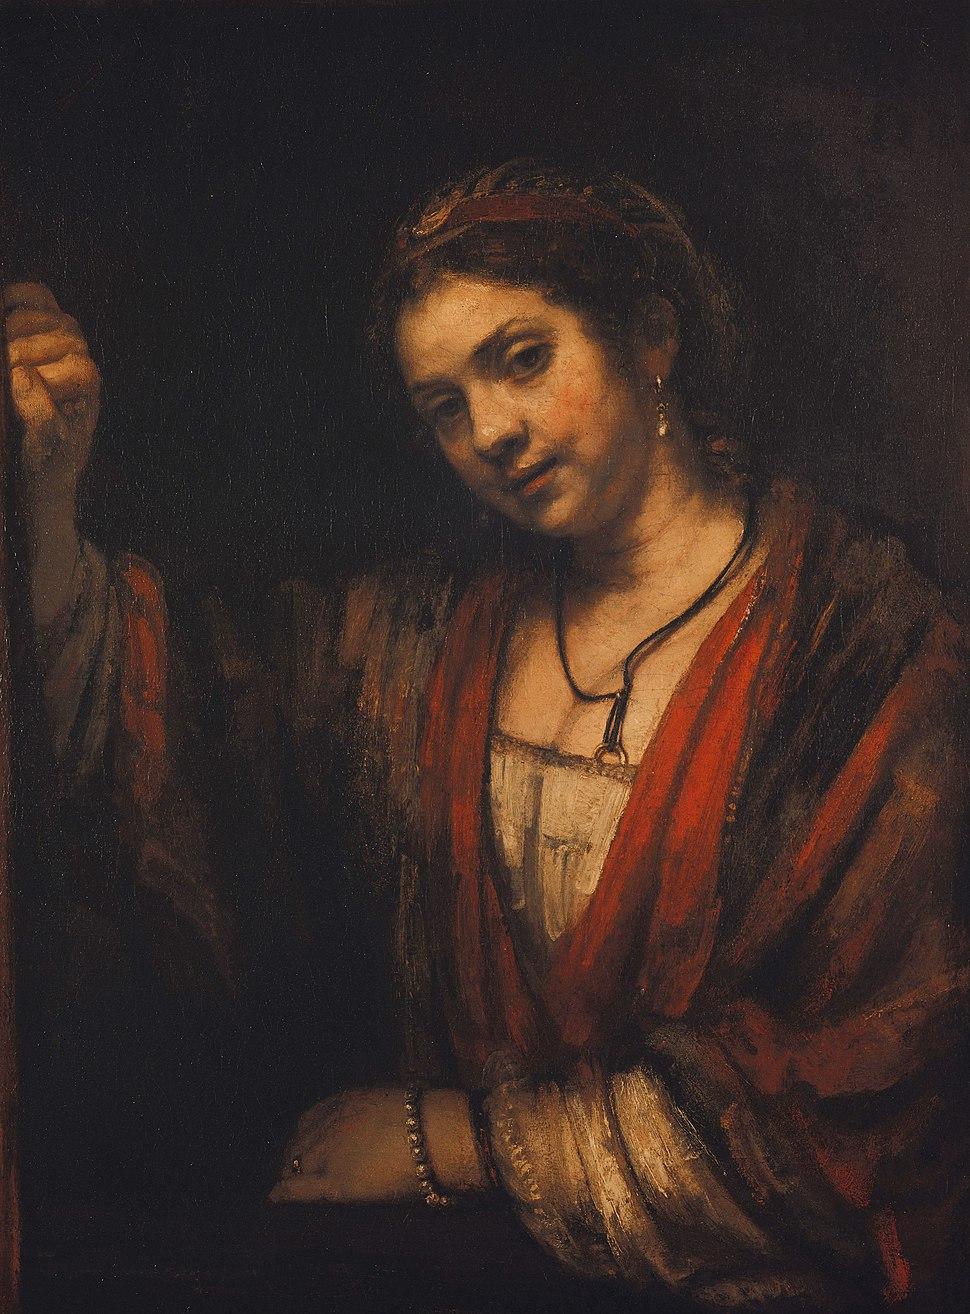 Rembrandt - Portrait of Hendrickje Stoffels - Google Art Project